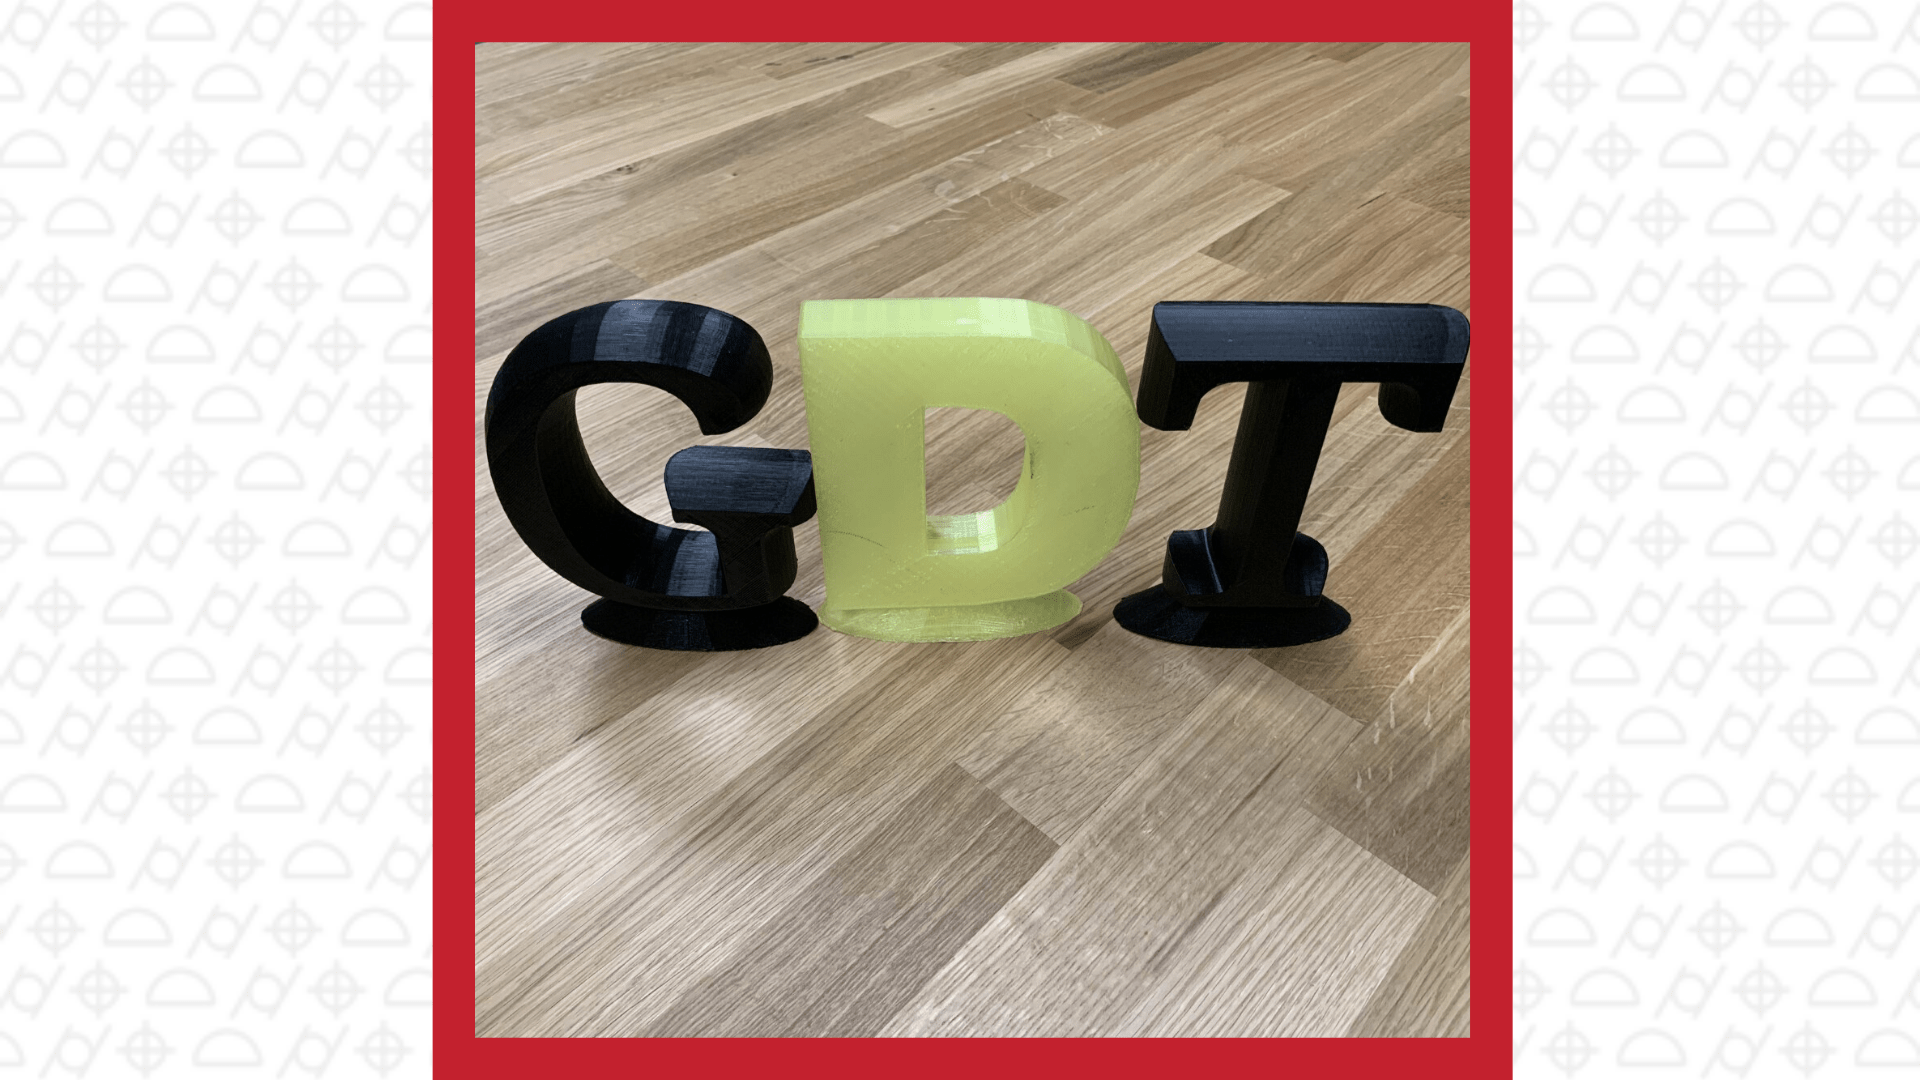 3D printed capital letters, black G, black T, yellow D